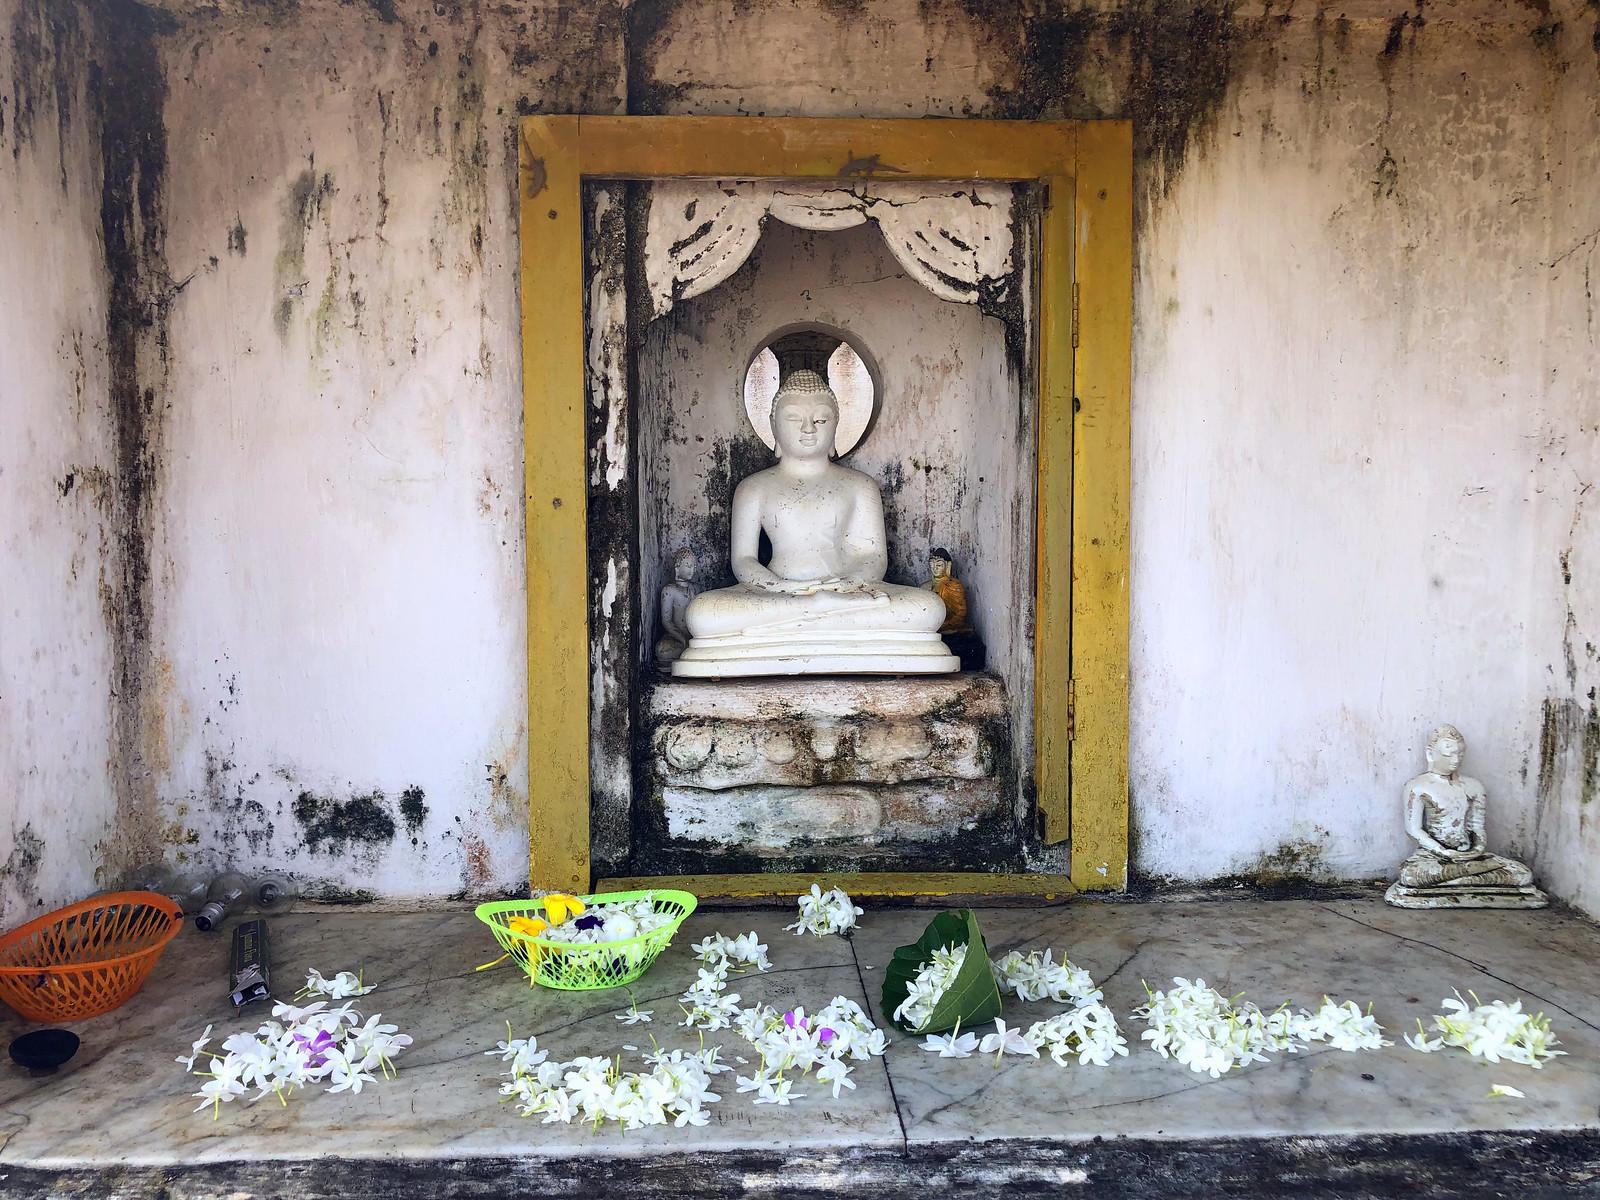 Aukana, la estatua de Buda más alta de Sri Lanka buda de aukana - 46781553601 e14fe5dac6 h - Buda de Aukana, la estatua de Buda más alta de Sri Lanka